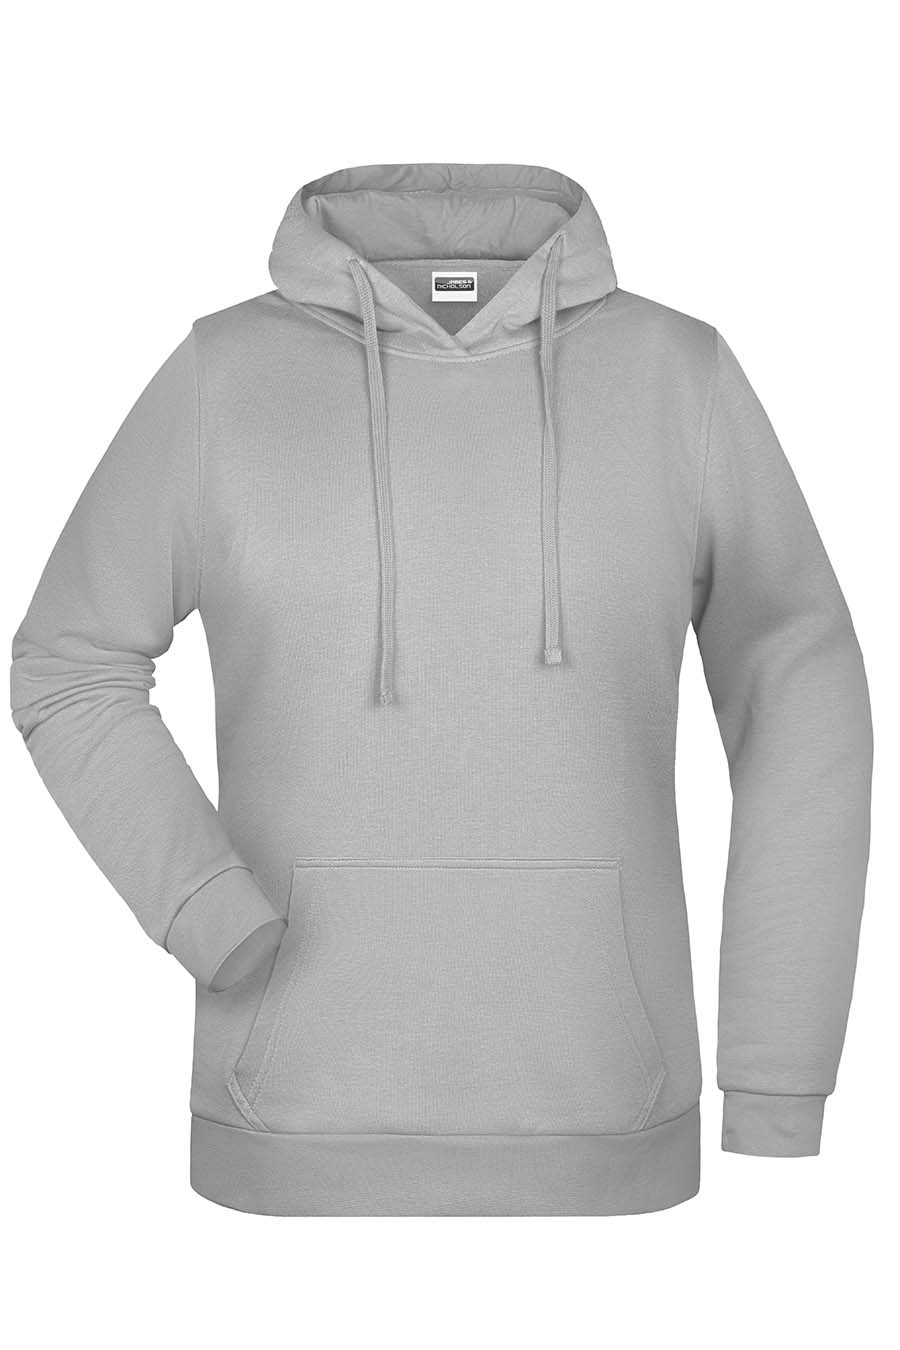 Sweat-shirt capuche femme - 20-1494-1